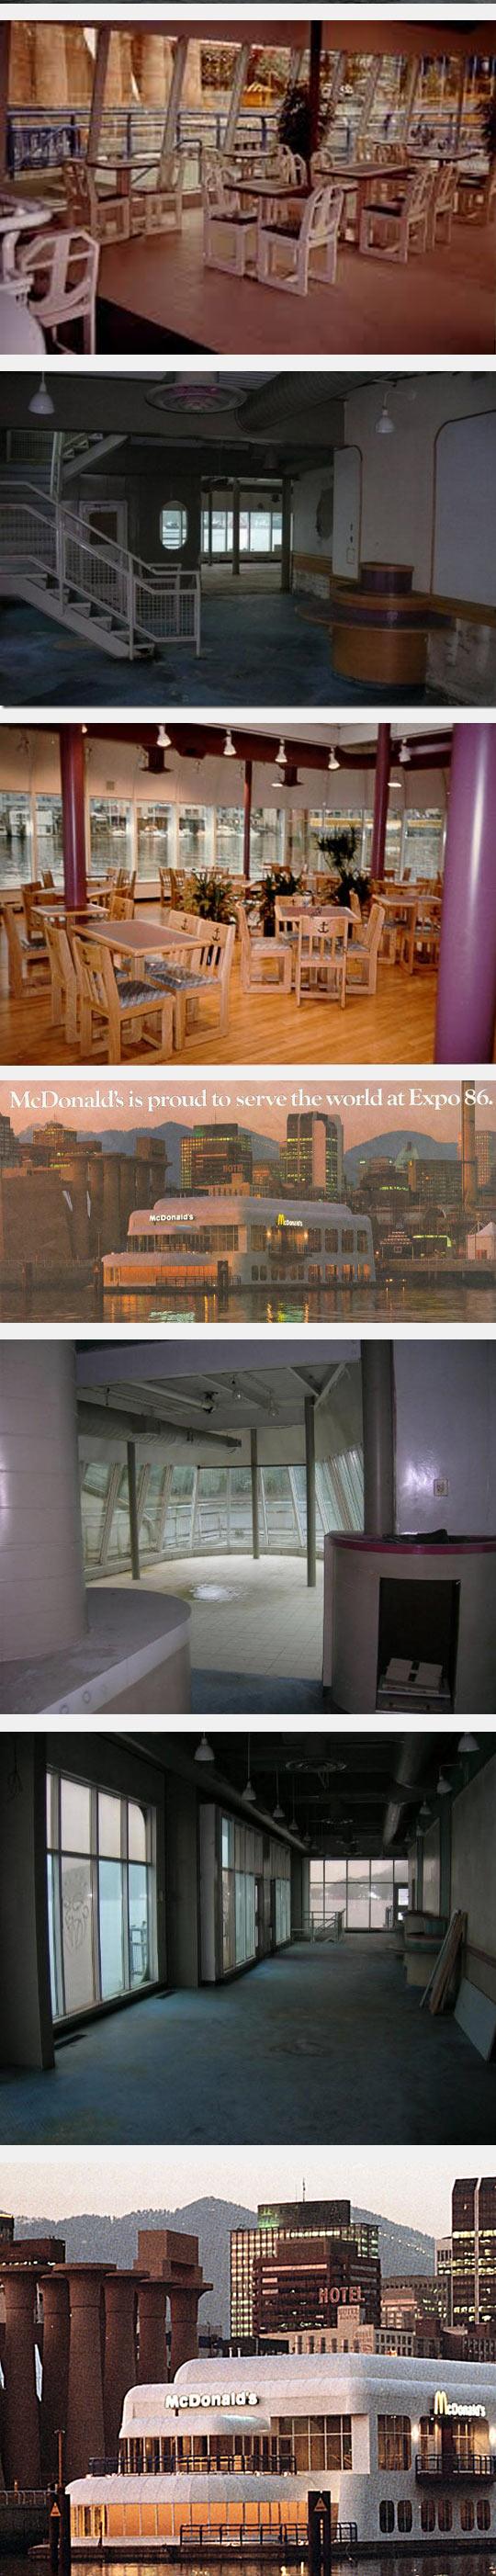 funny-boat-restaurant-McDonalds-abandoned-Vancouver